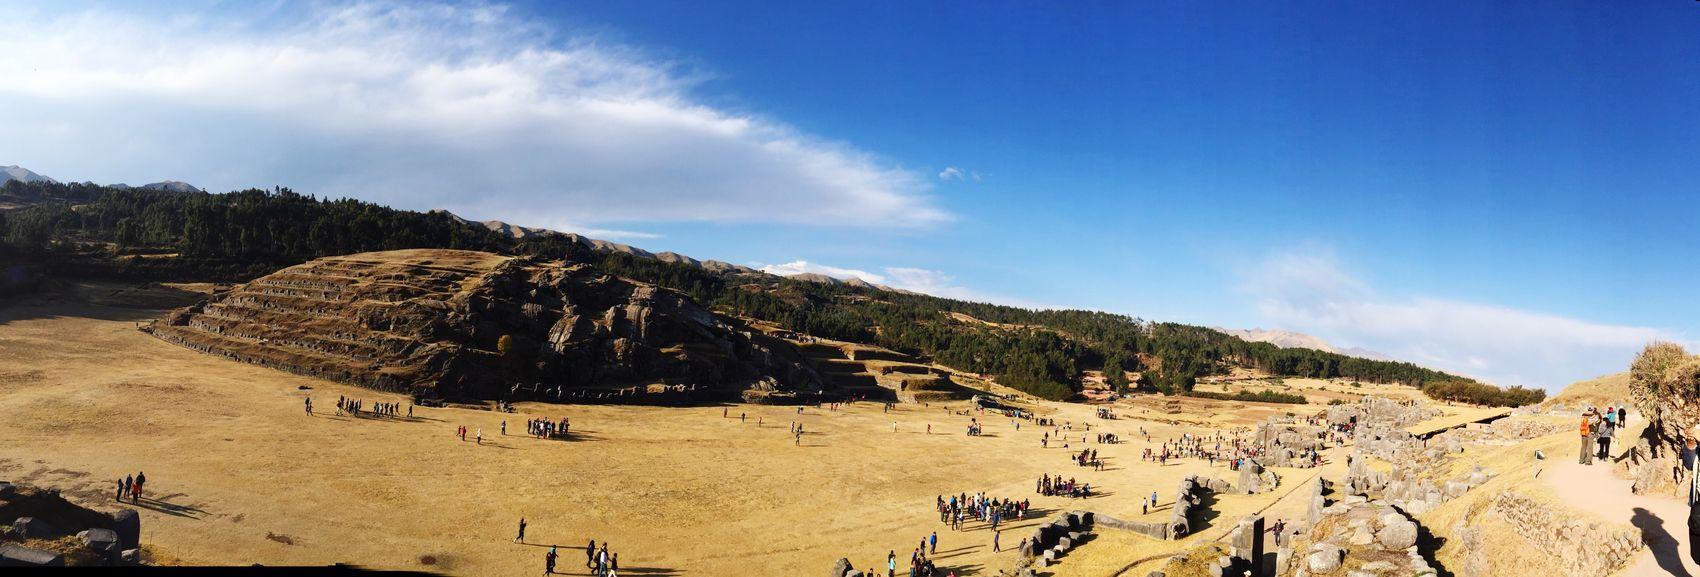 Sacsayhuaman Cusco Peru View Landscape